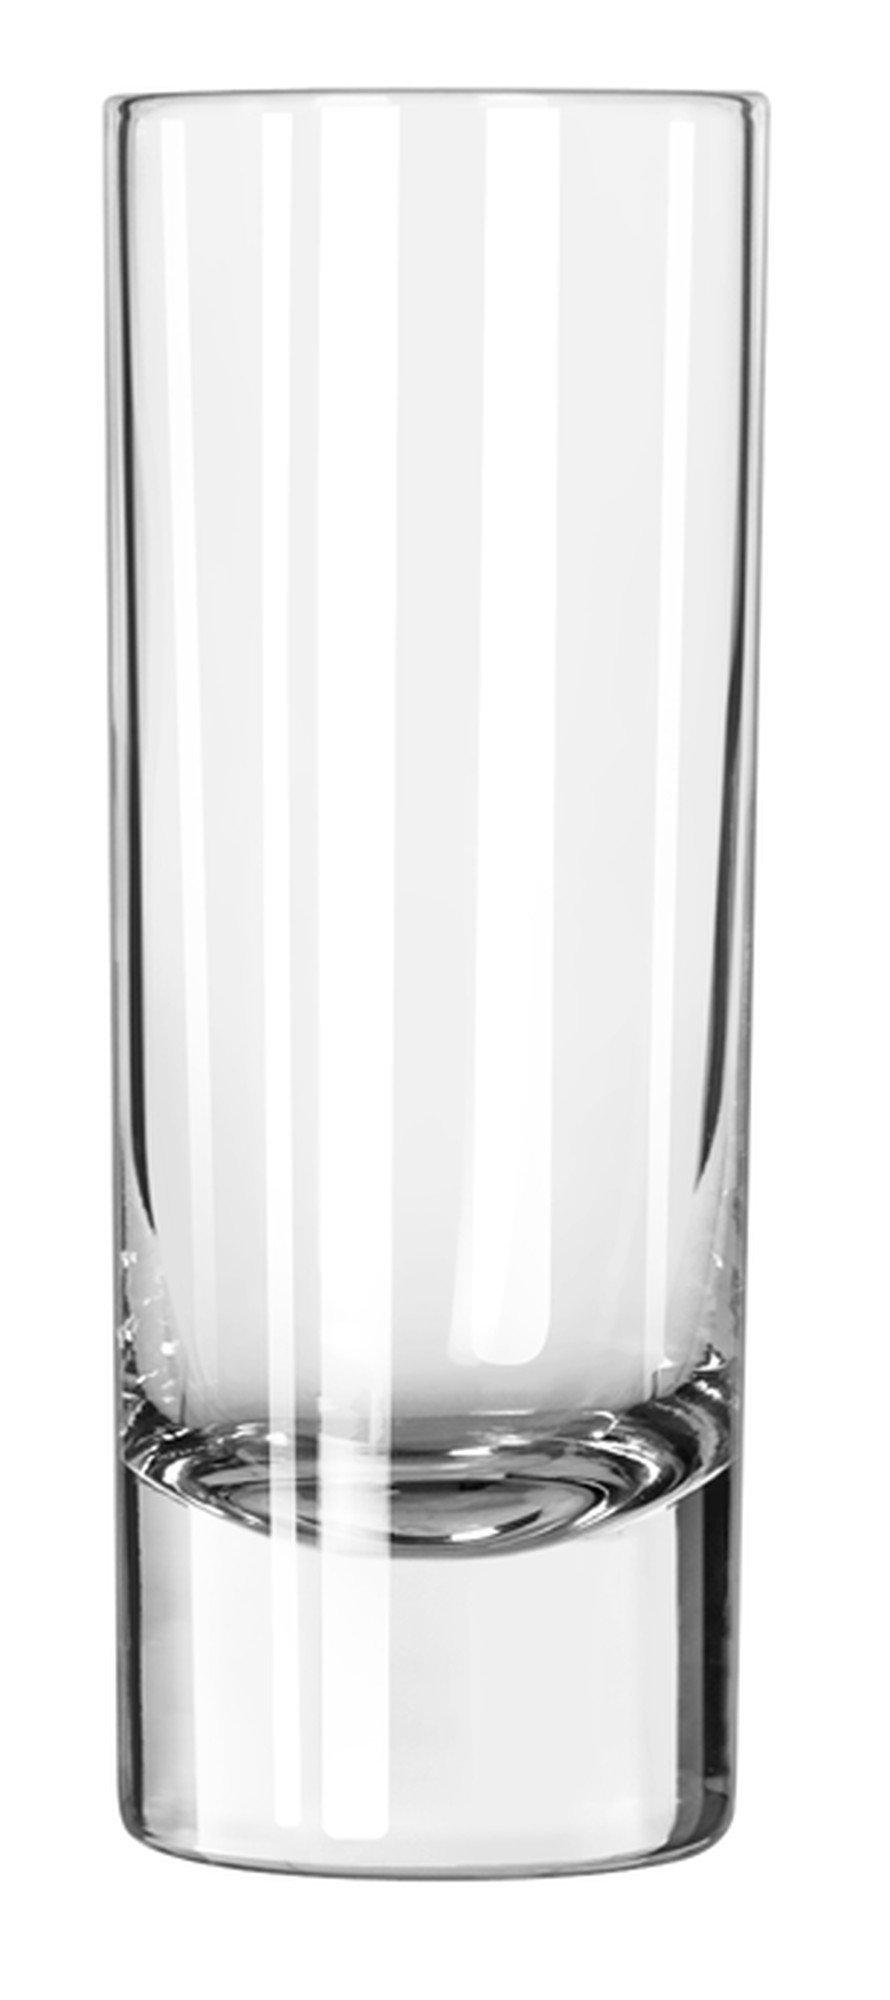 Libbey Cordial Glass (1650SR), 2.5oz - Case of 24